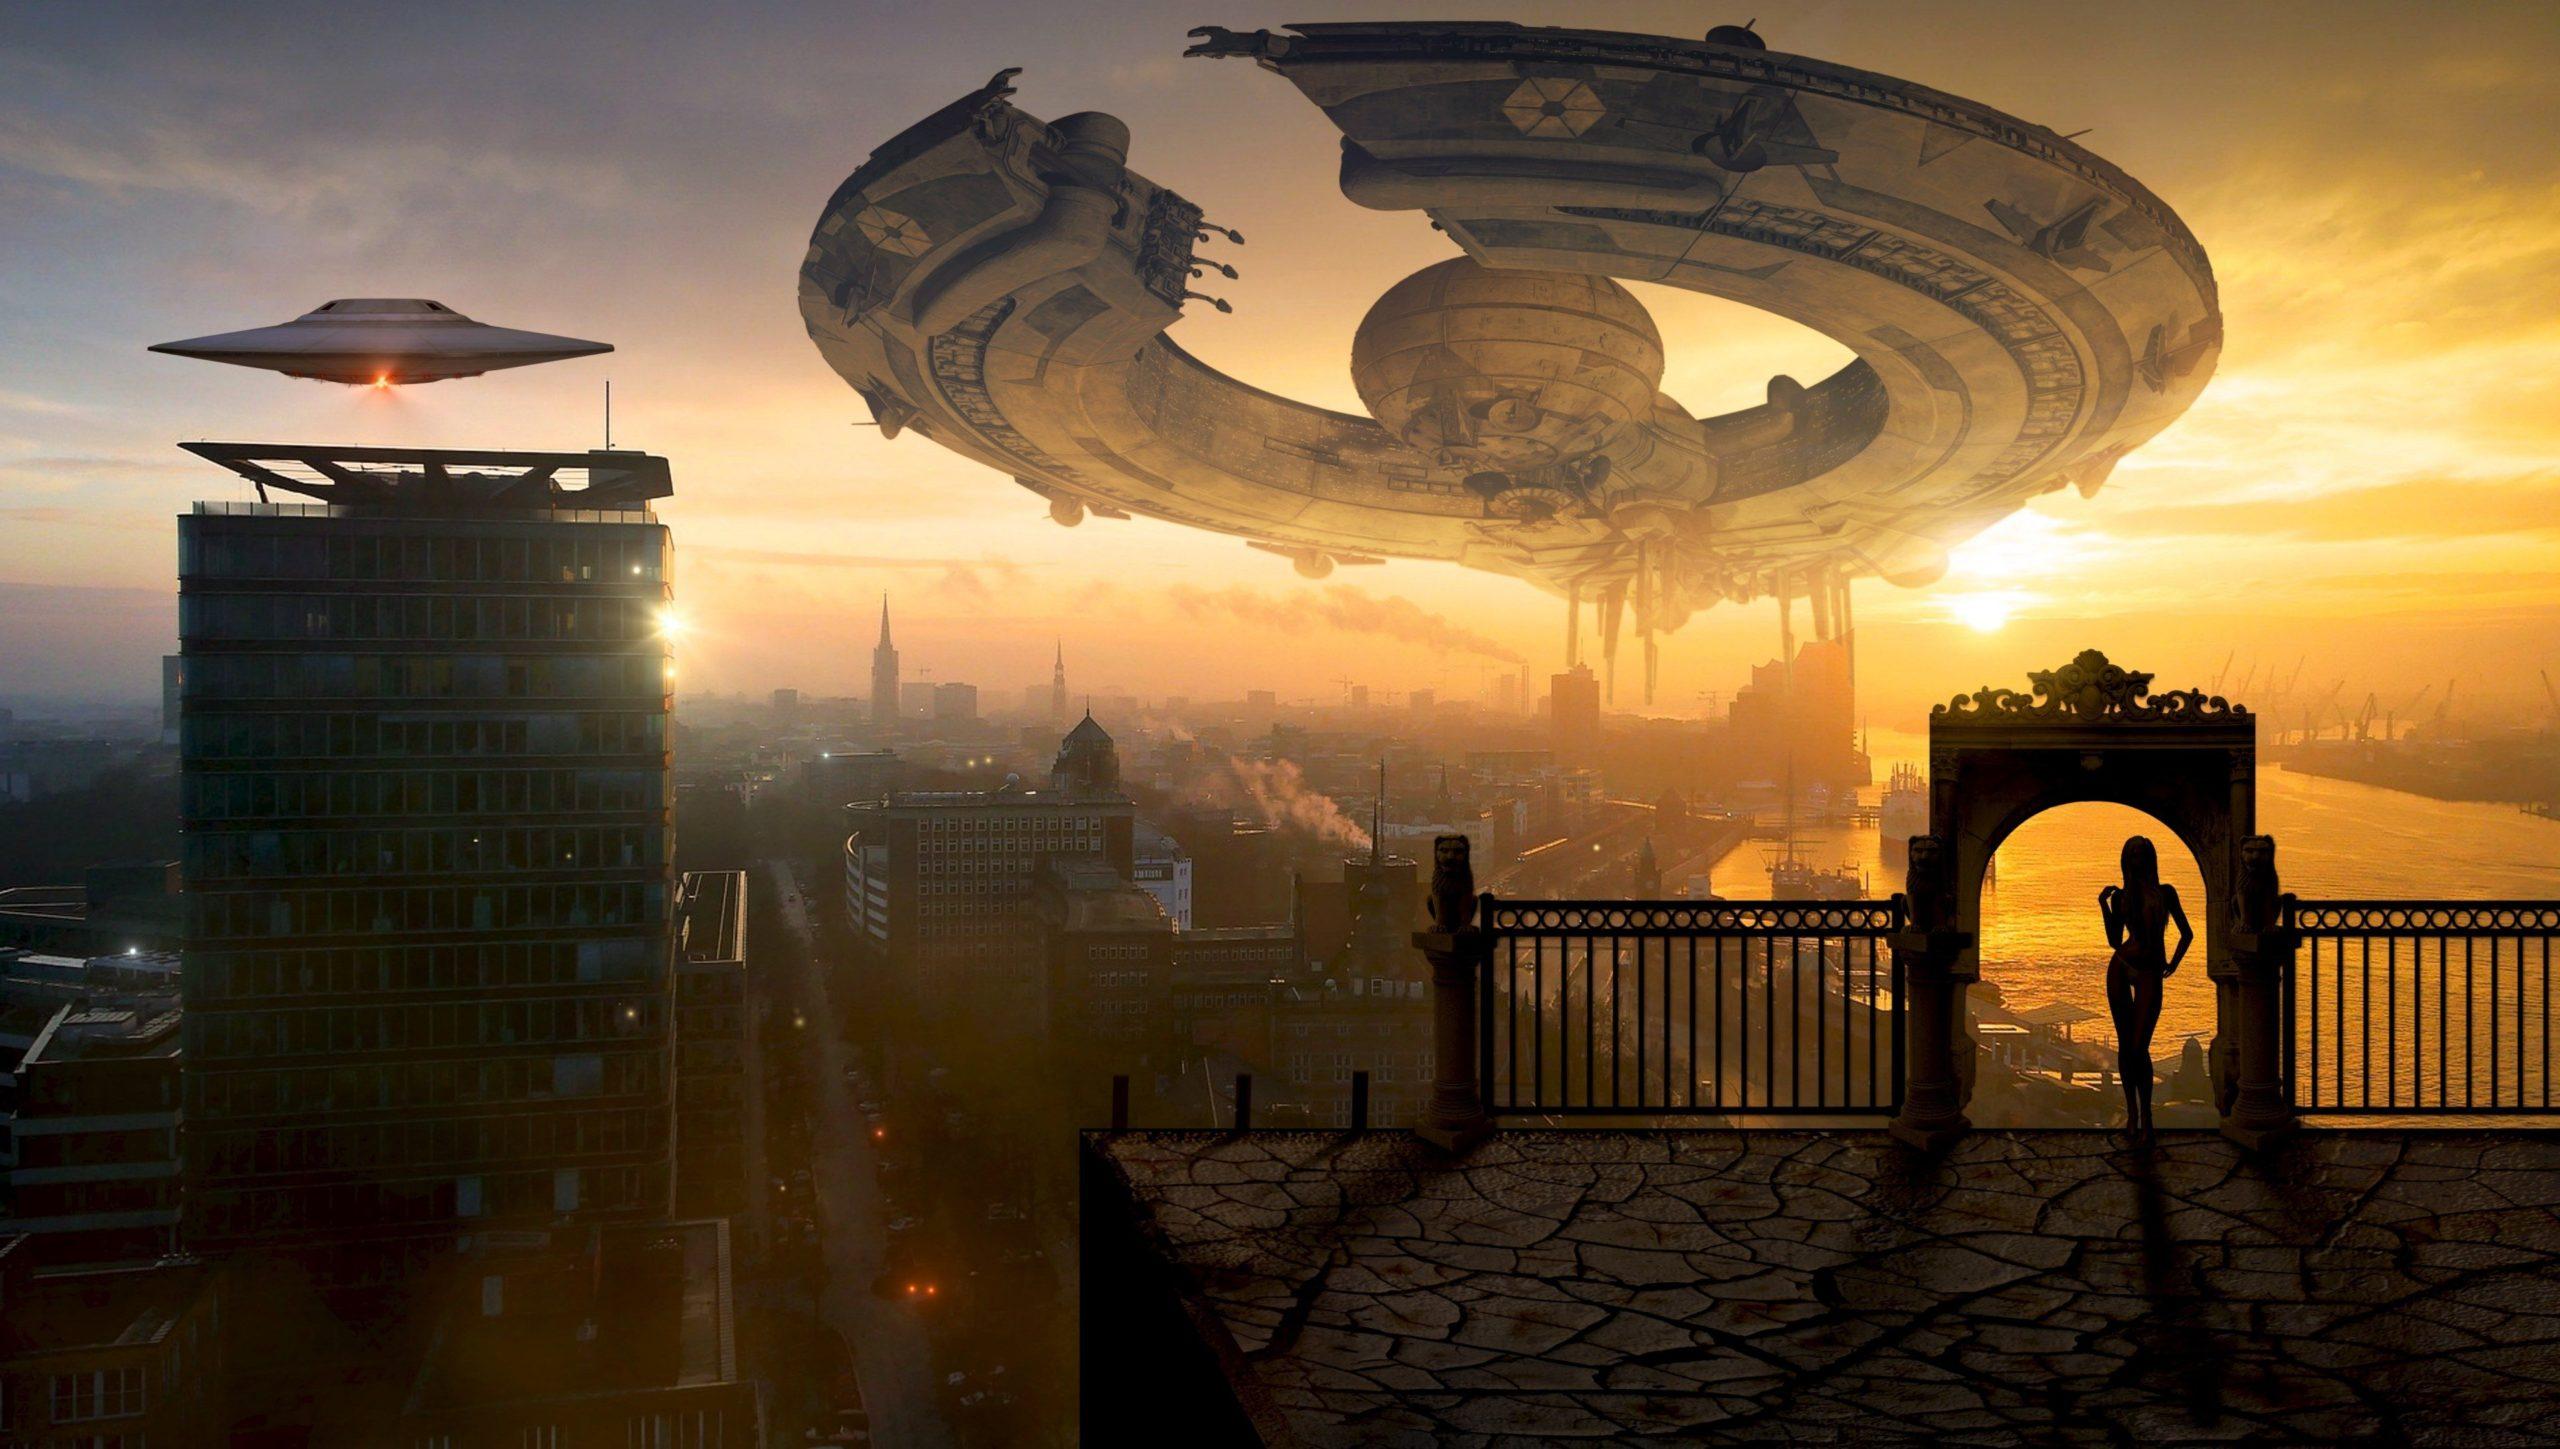 spaceship images free